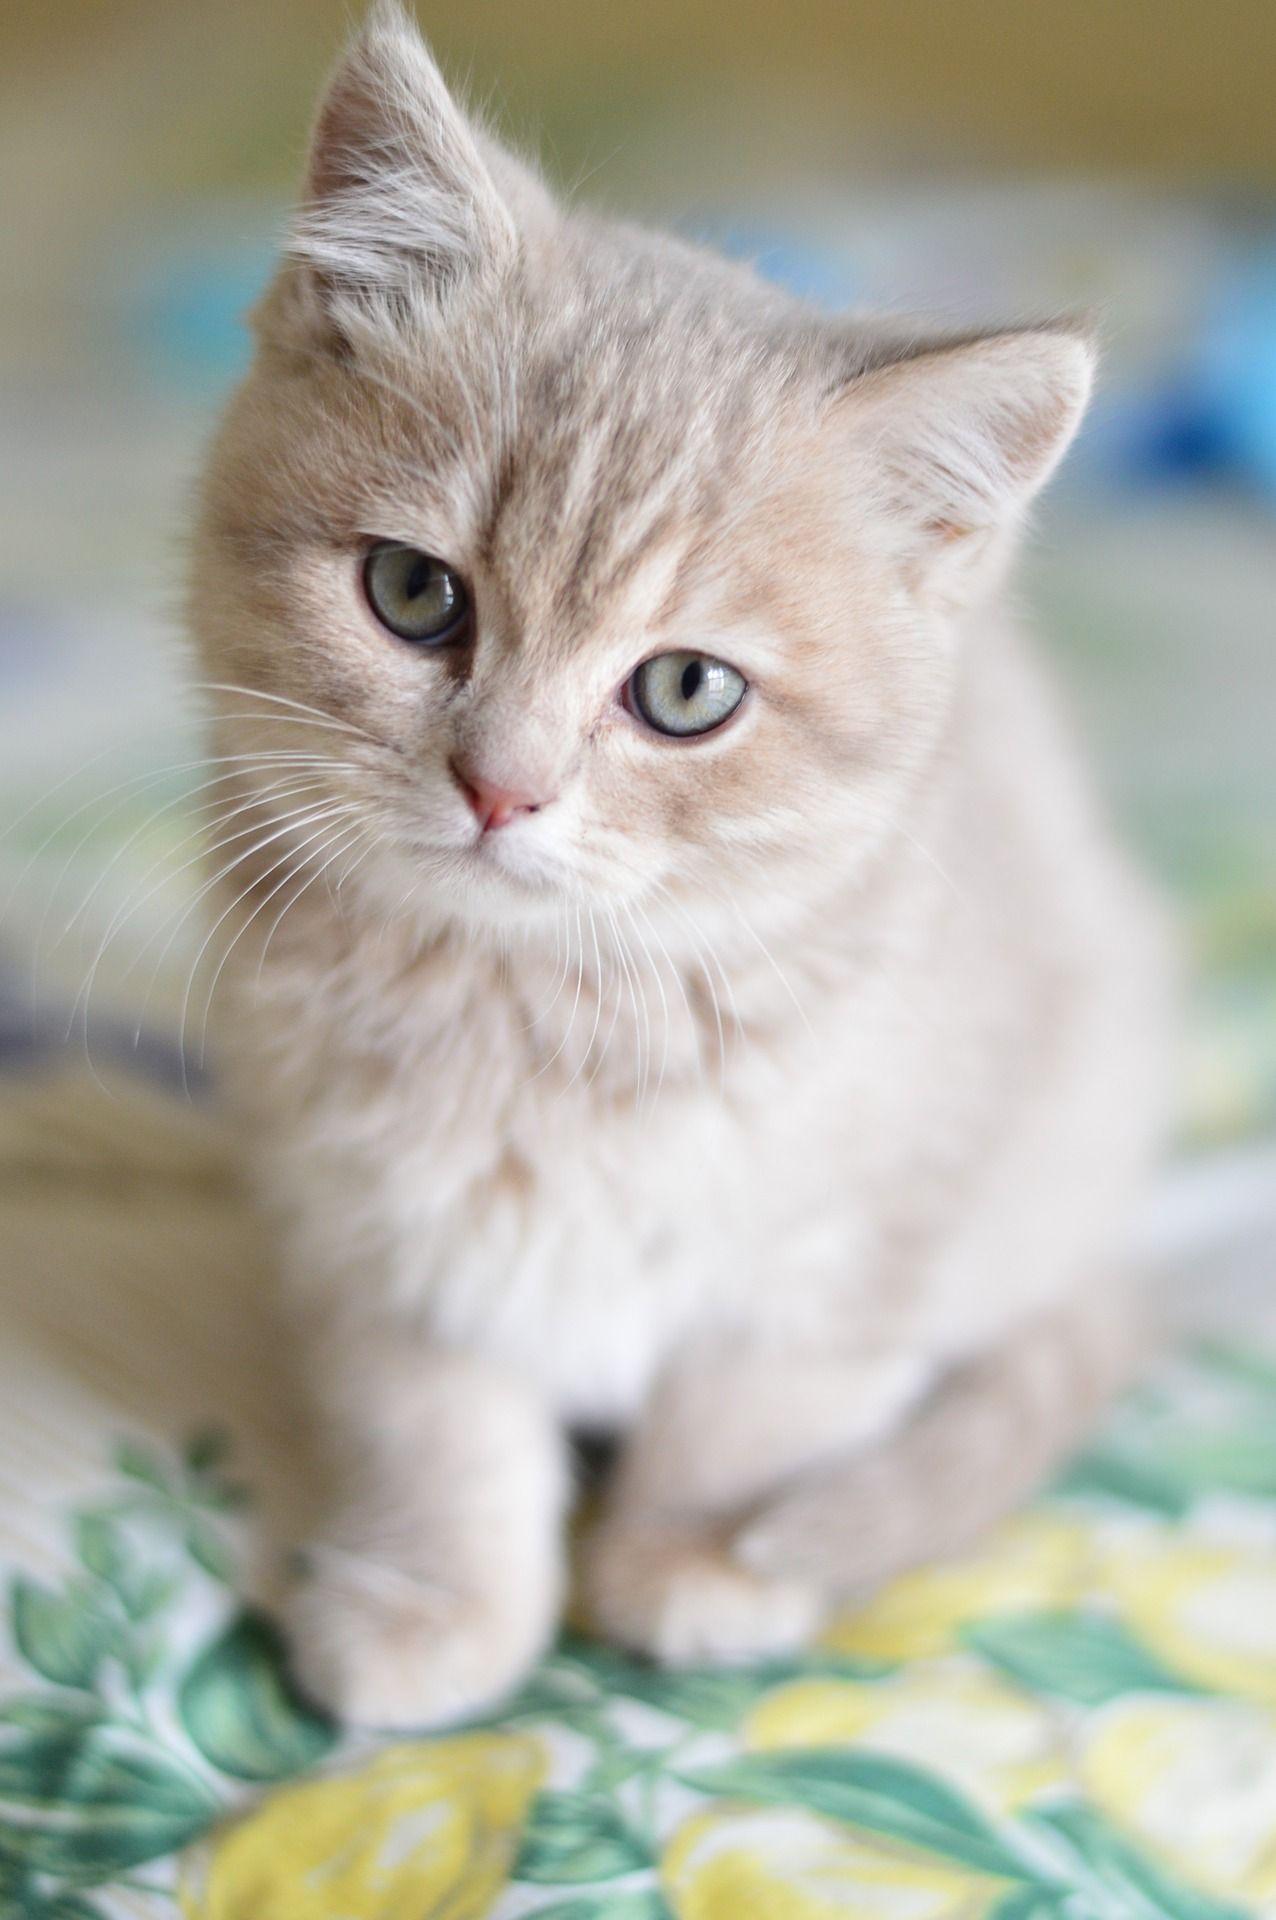 Meet the Instagram Sensation Omar The World Longest Cat